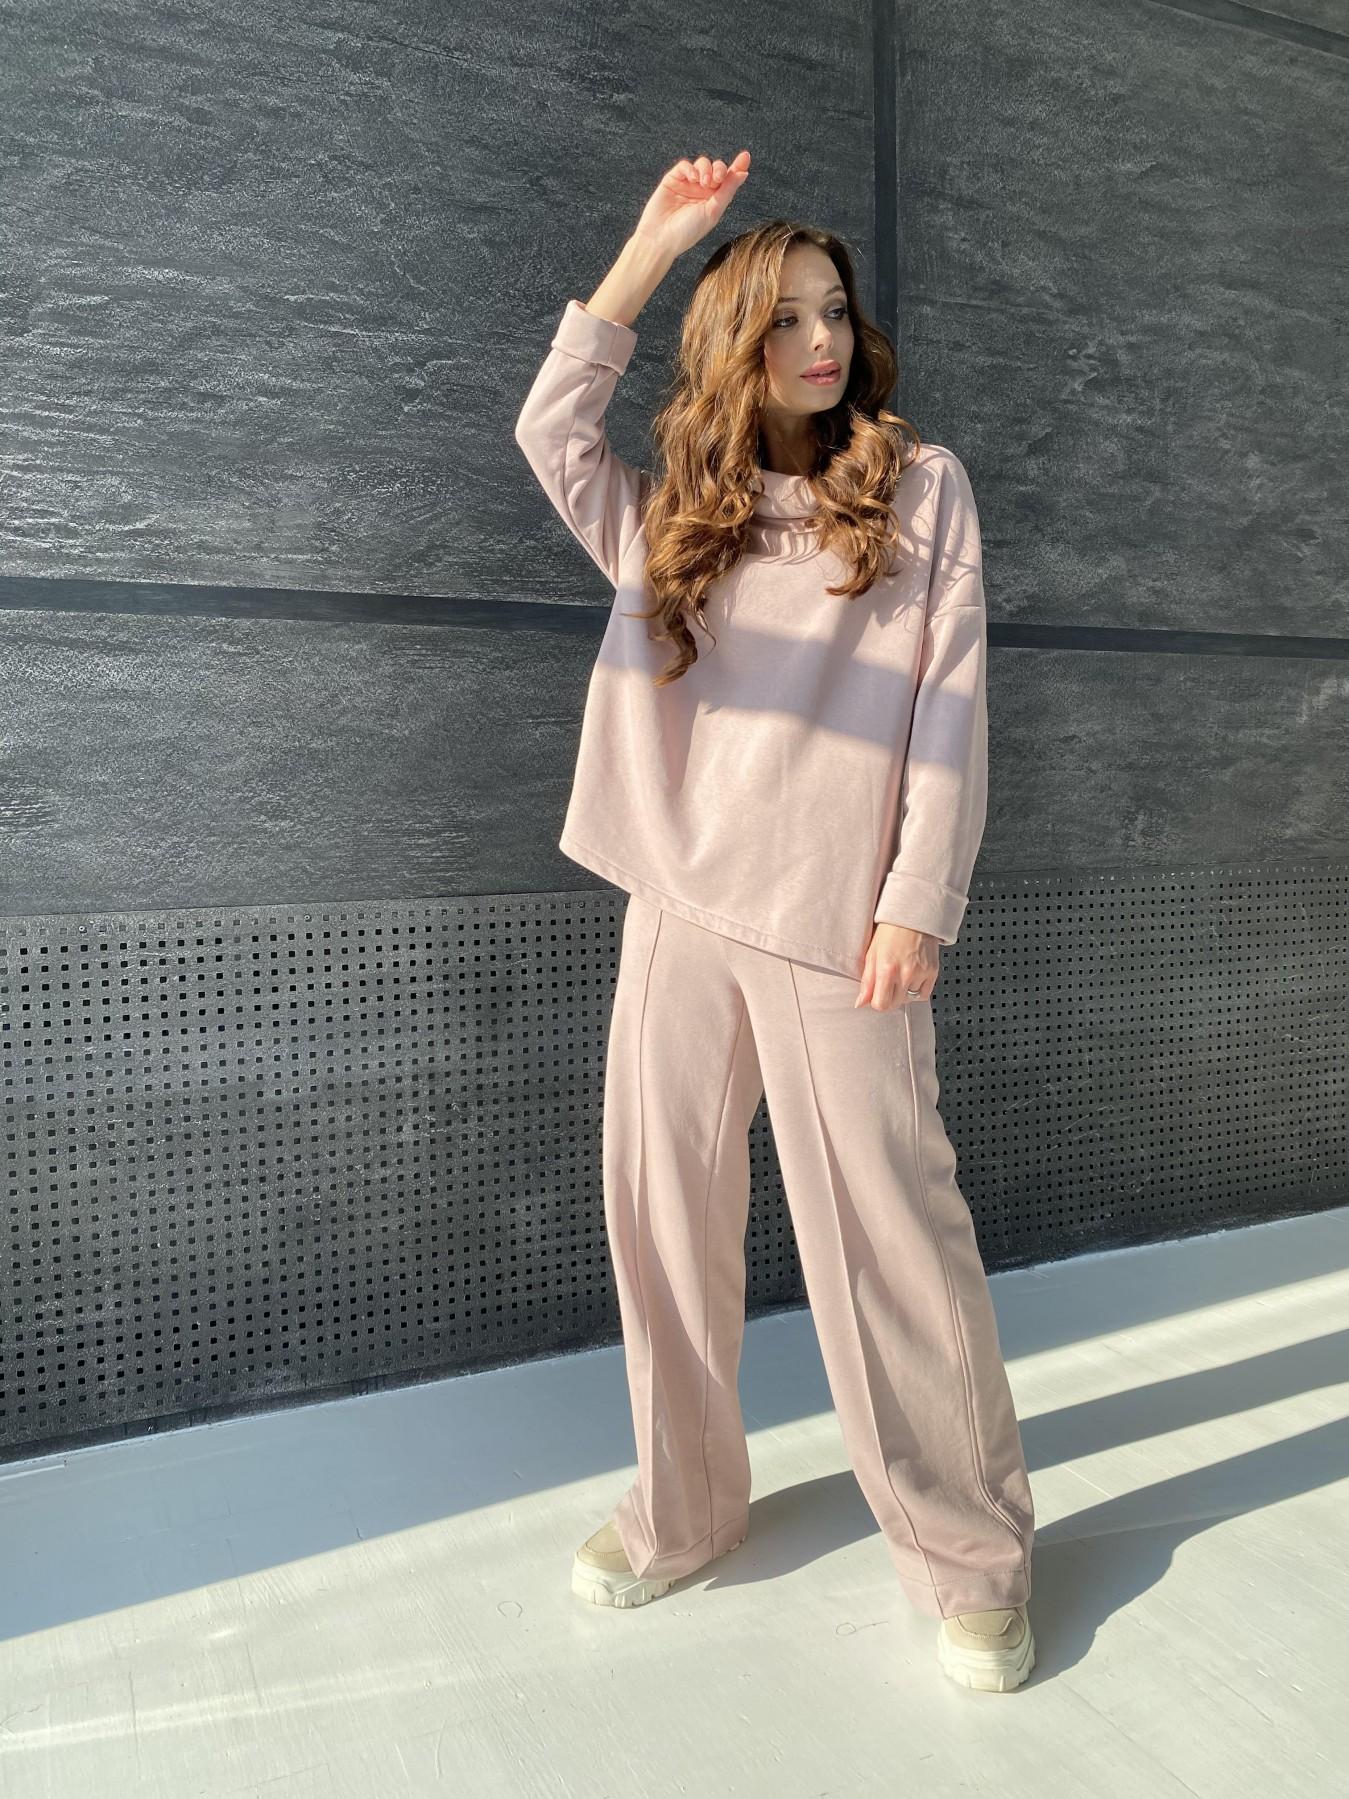 Джаст костюм Oversize  3х нитка 10564 АРТ. 46912 Цвет: Кофе - фото 3, интернет магазин tm-modus.ru